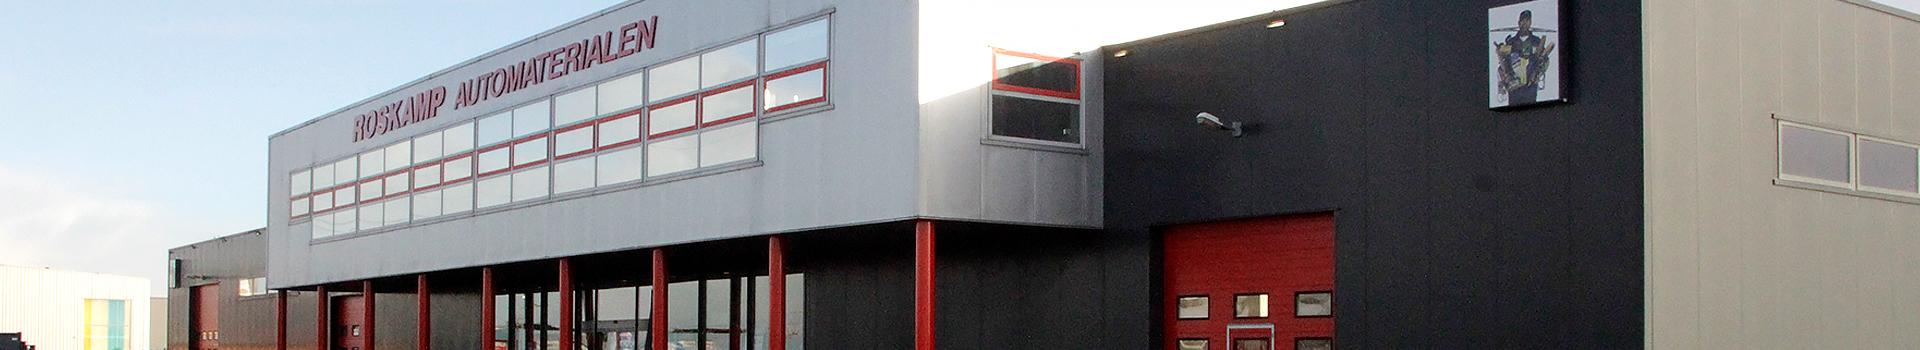 Roskamp Automaterialen Pand Stadskanaal